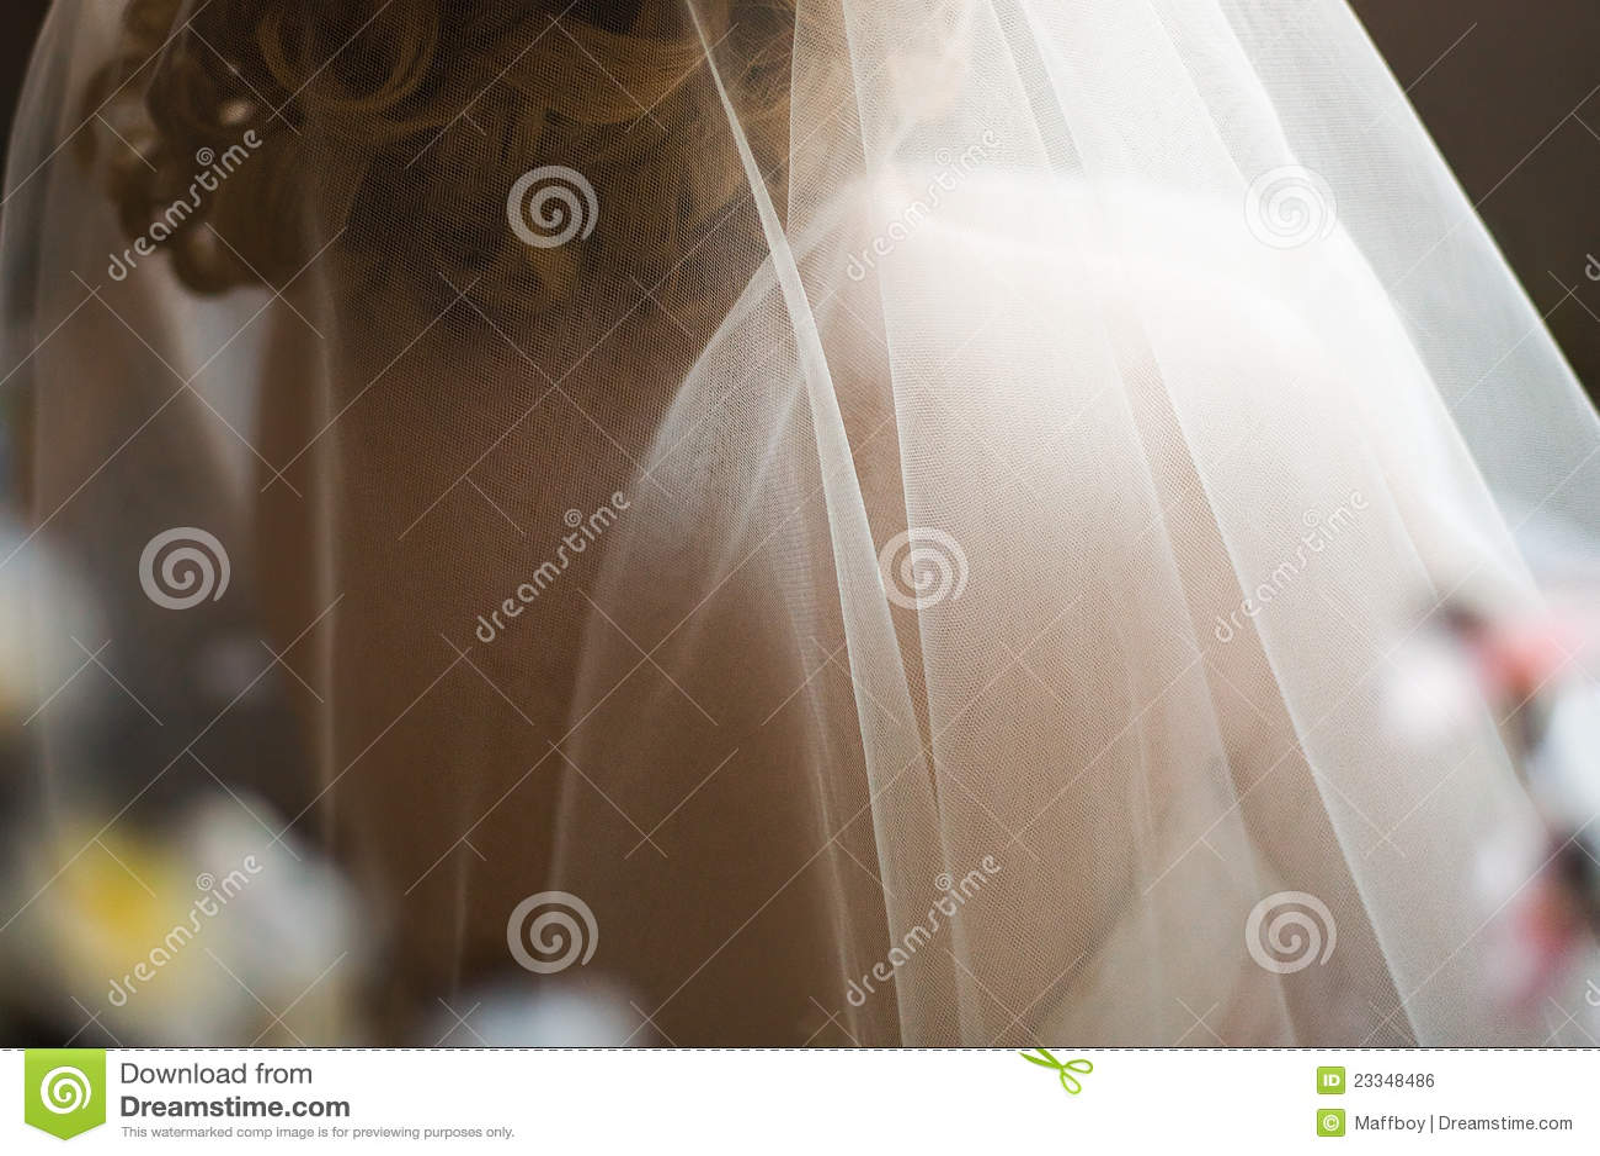 Véu nupcial Wedding